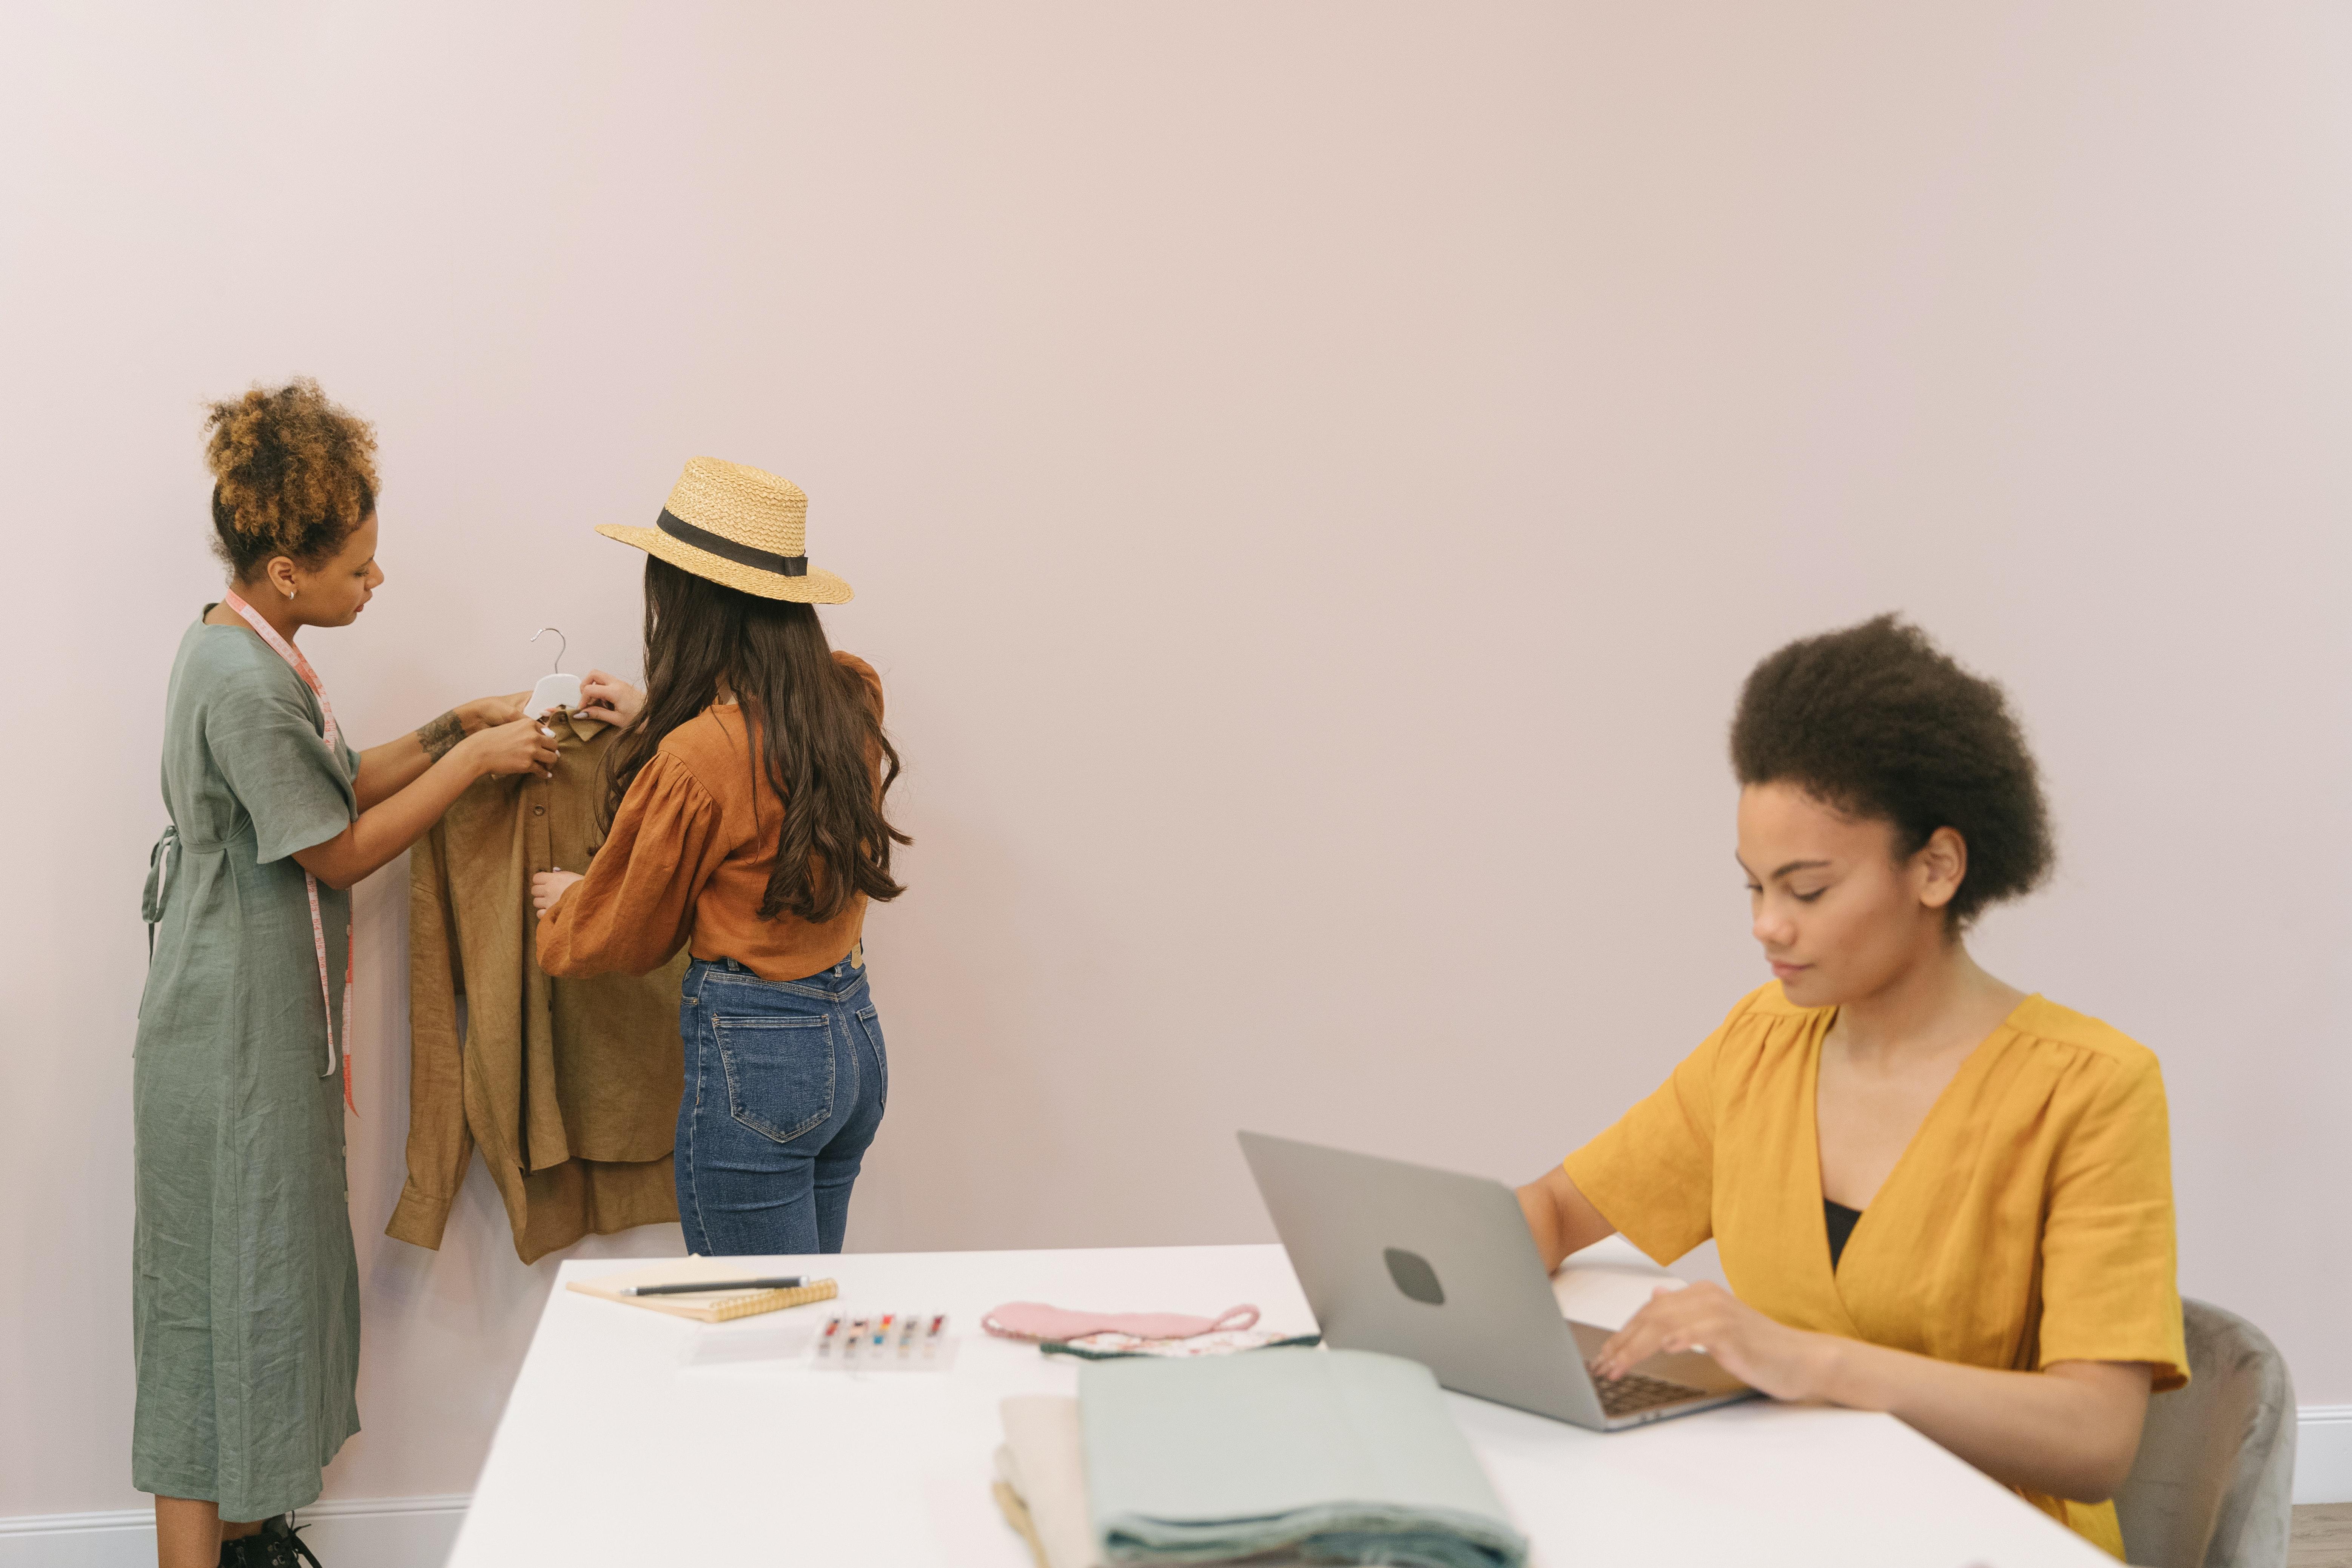 Women running a fashion business